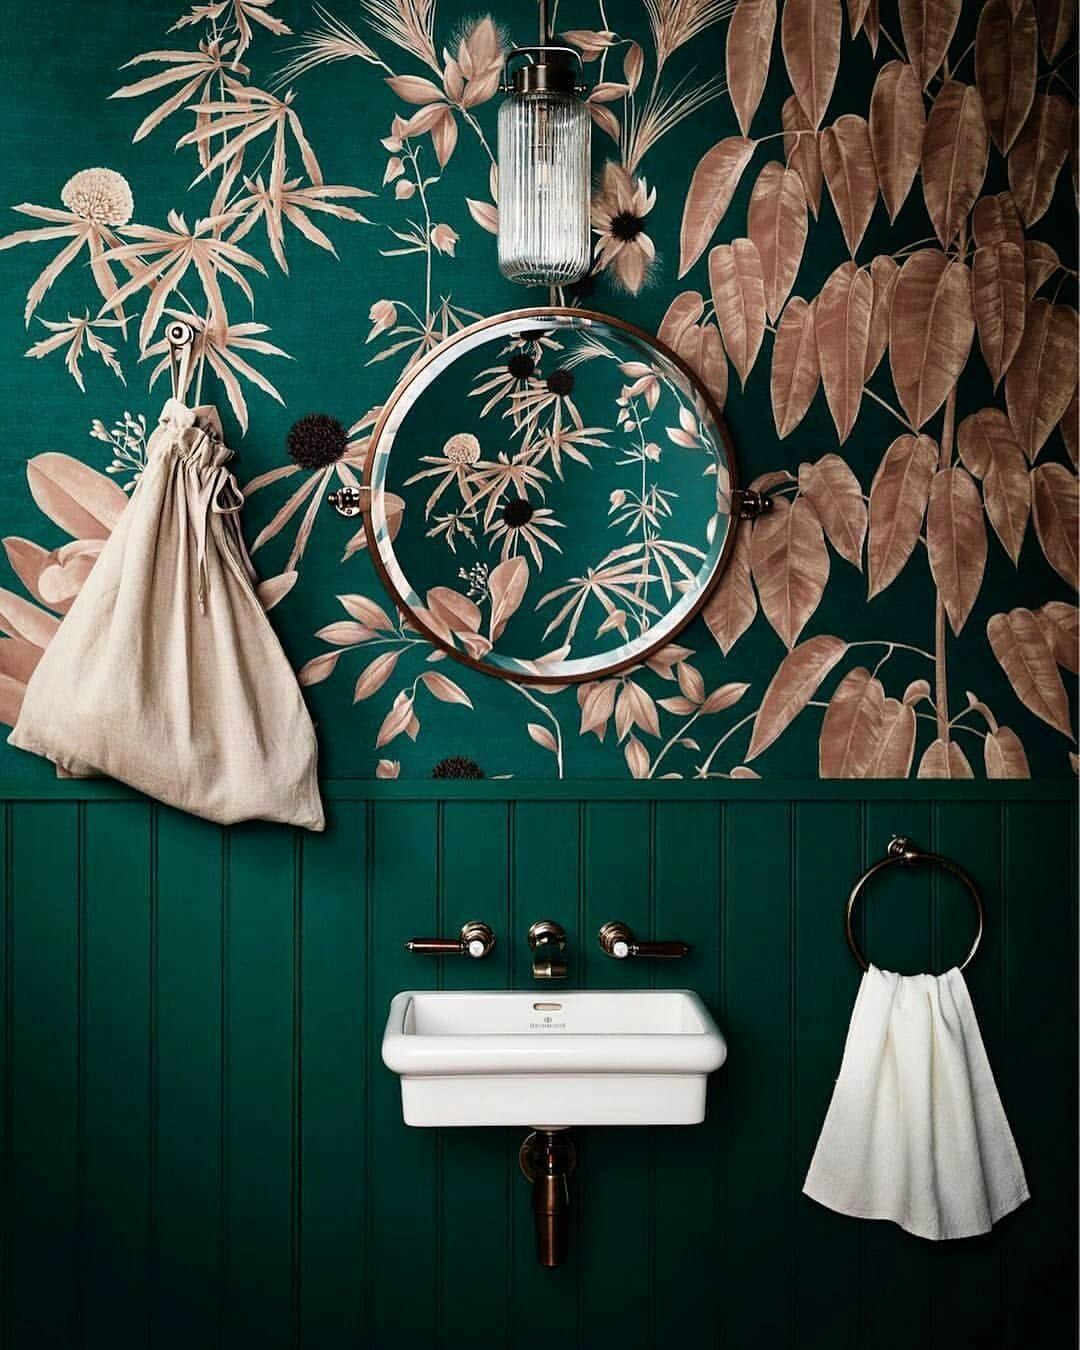 Forest Green Color Trends 2018 19 Green Color Trends Green Bathroom Blush Pink Wallpaper